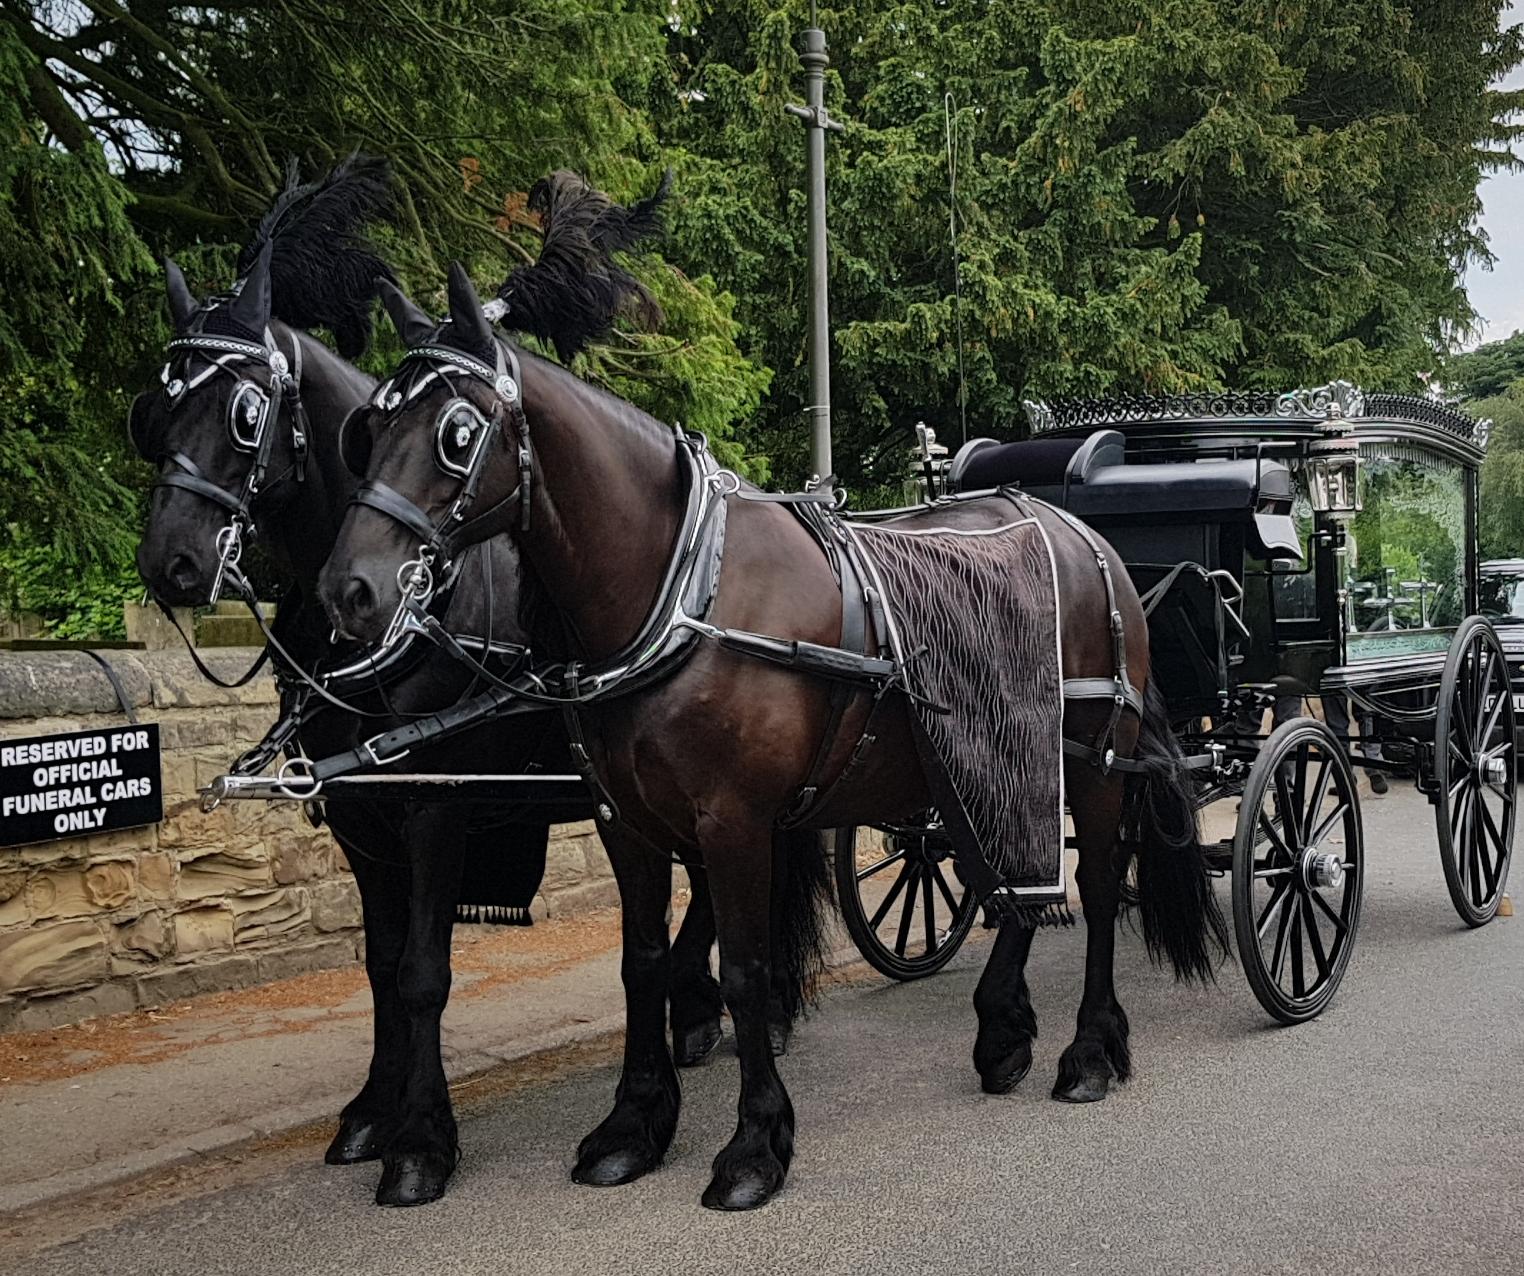 Funeral Horses